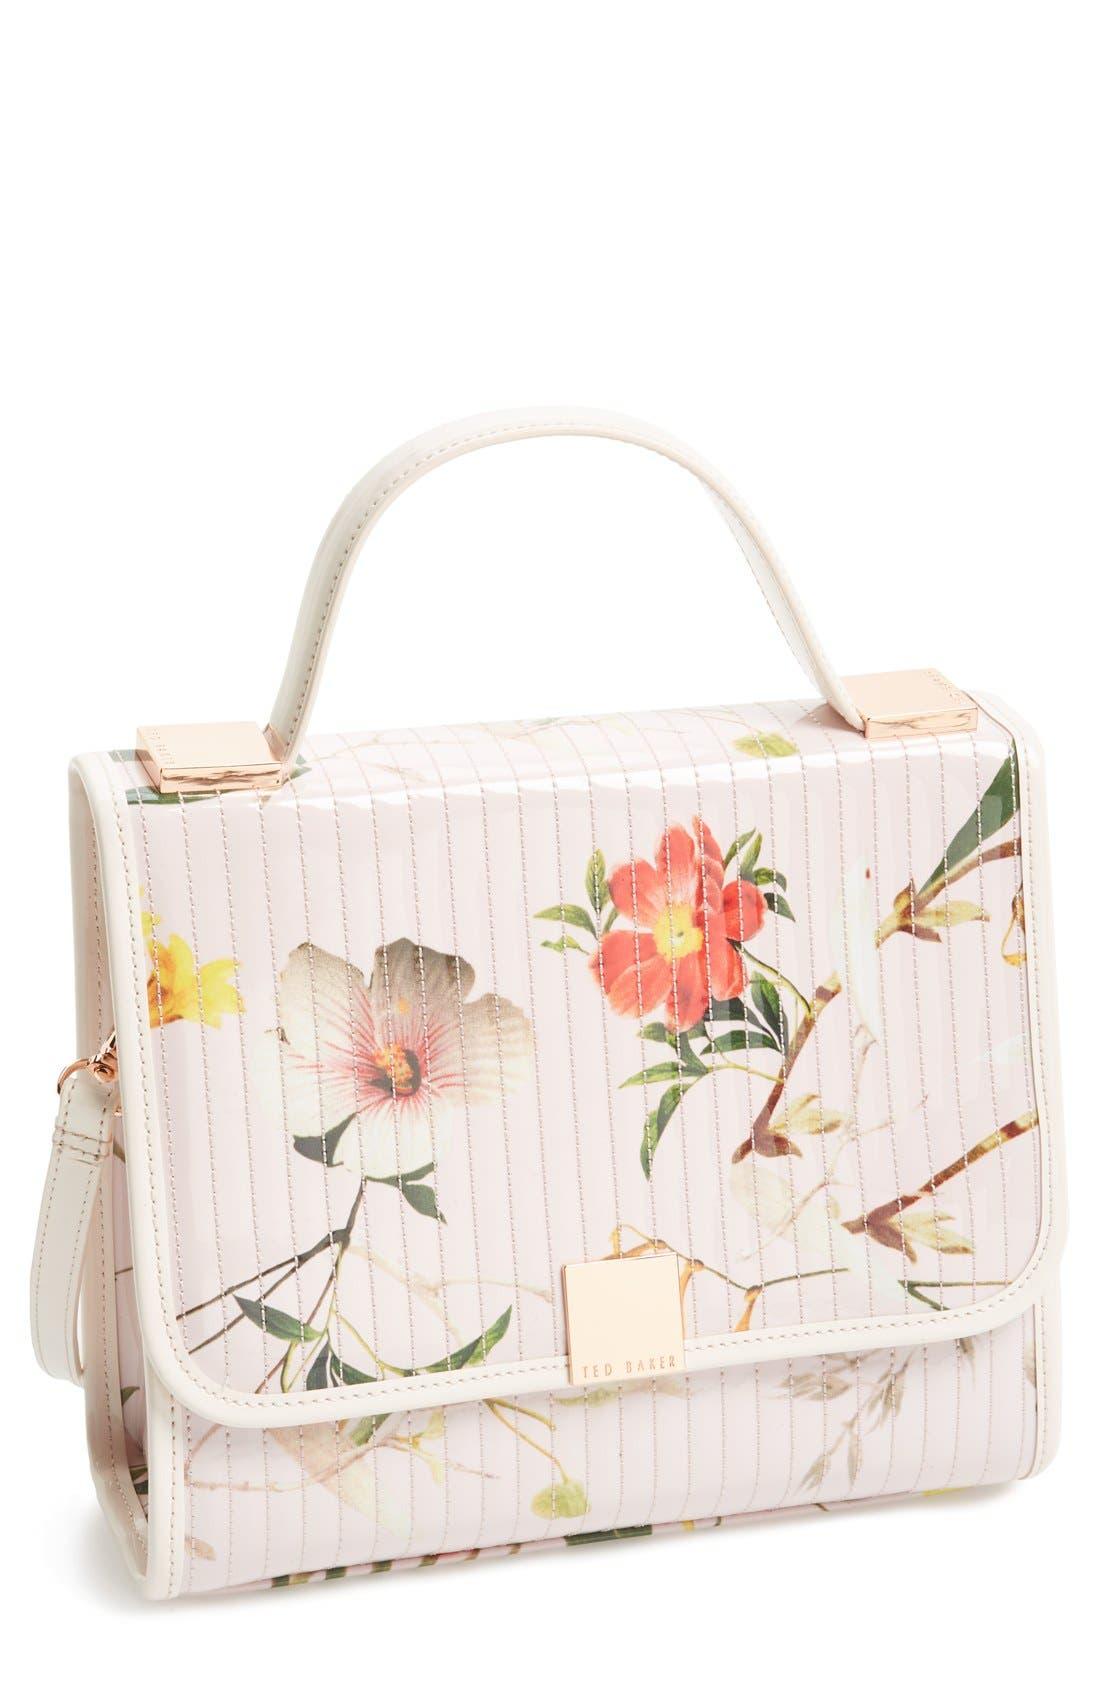 'Botanical Bloom' Crossbody Bag,                             Main thumbnail 1, color,                             680